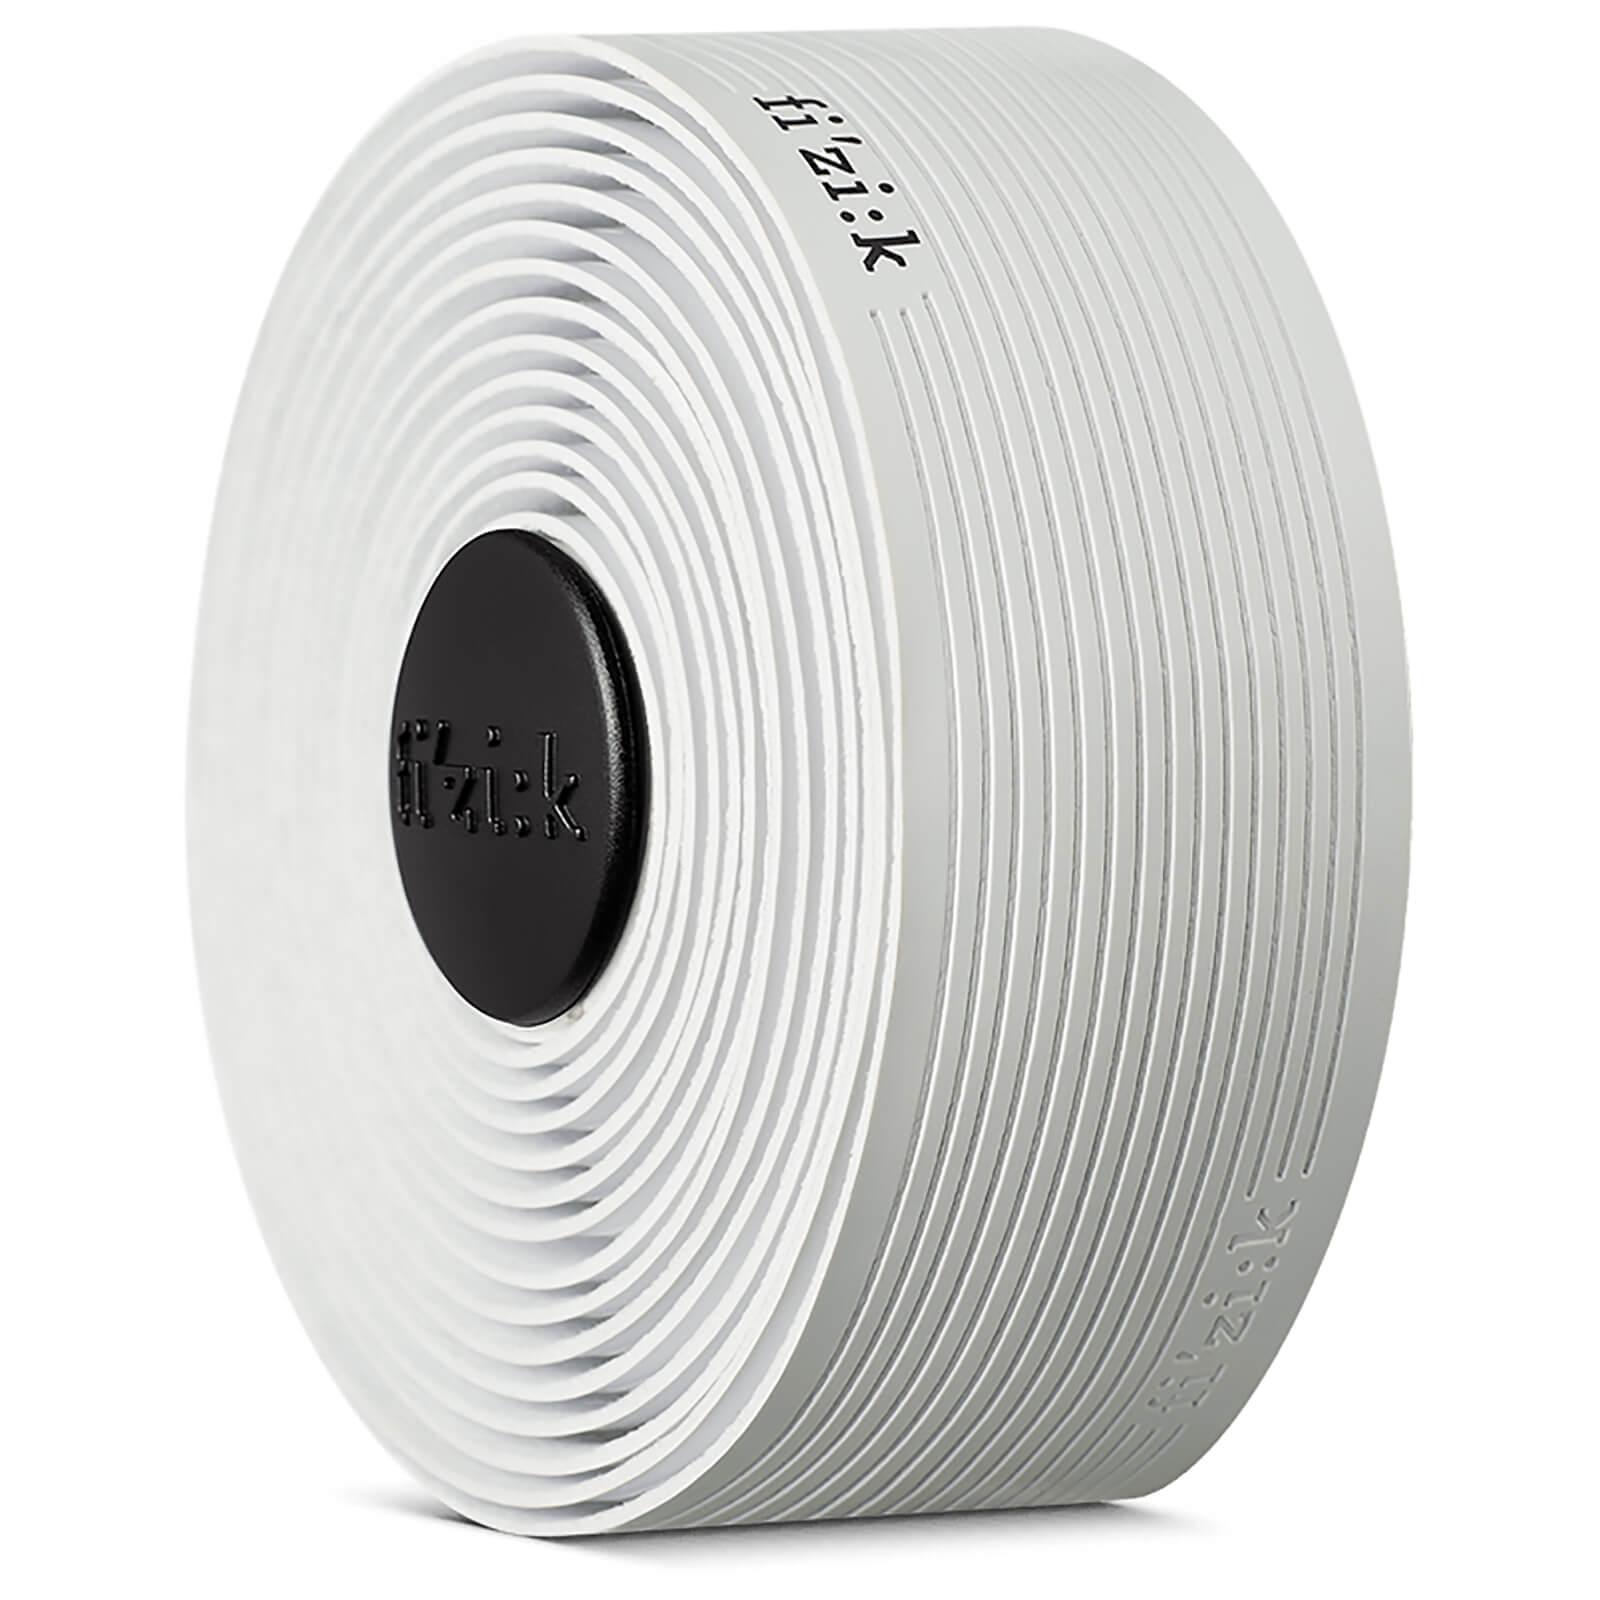 Fizik Vento Microtex Tacky Handlebar Tape - White